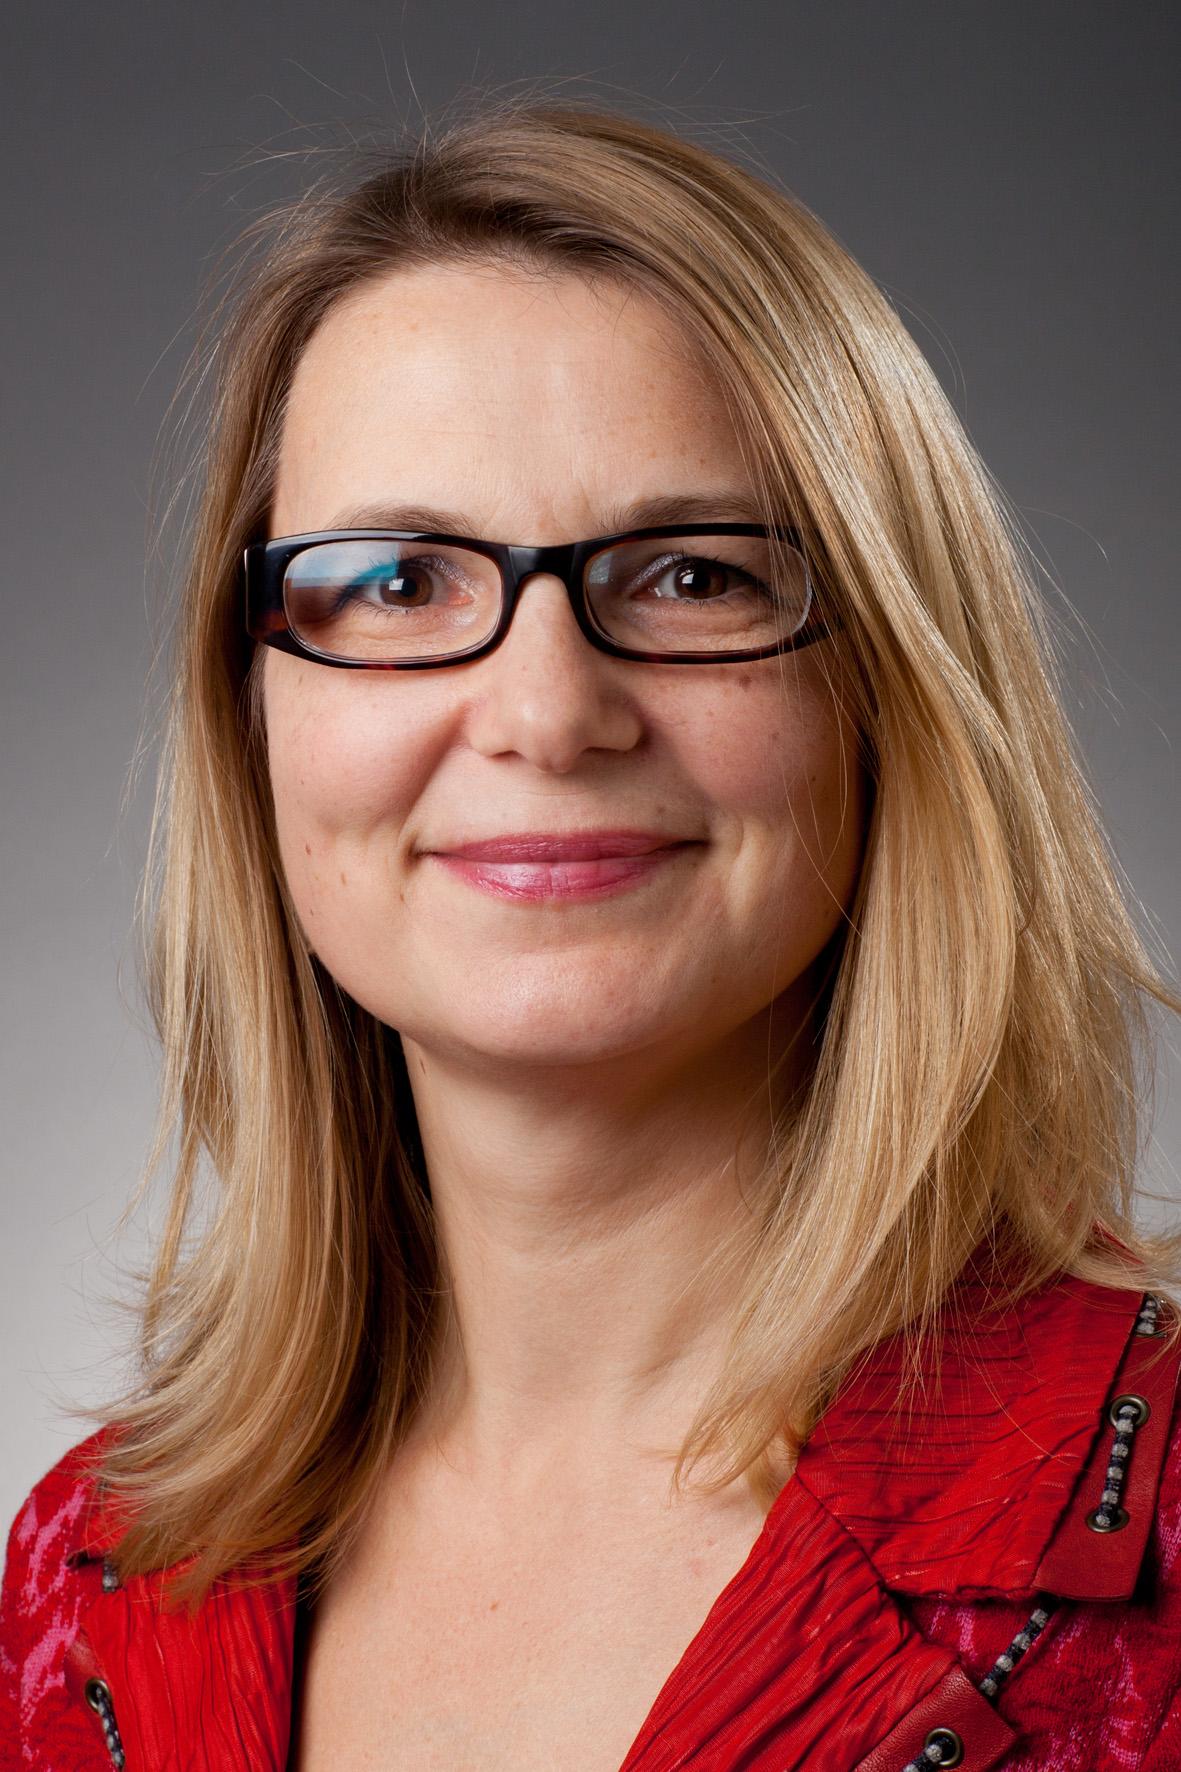 Annika Büchert Lindberg